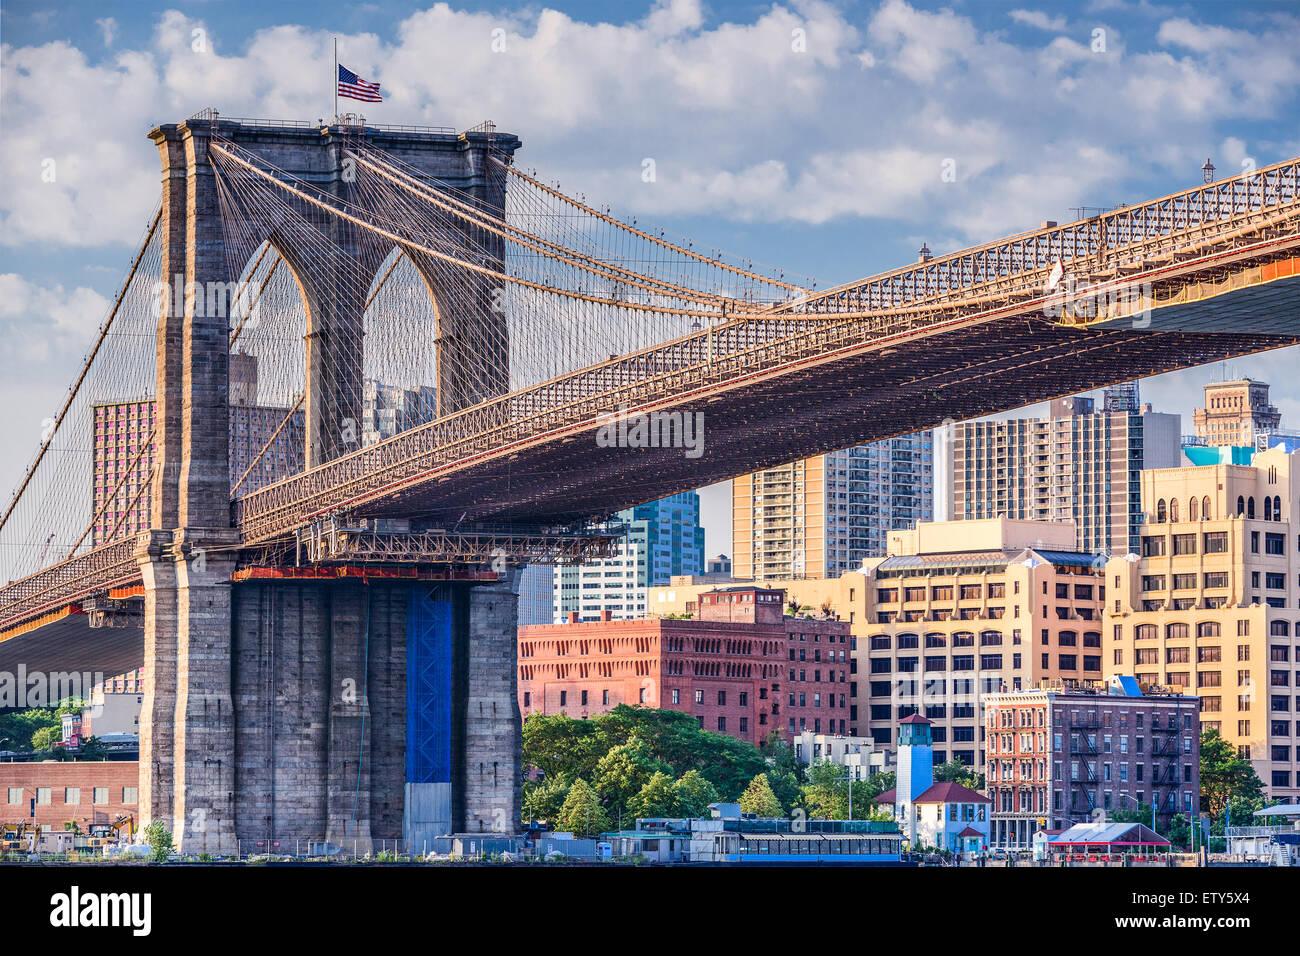 Brooklyn Bridge in New York City. - Stock Image